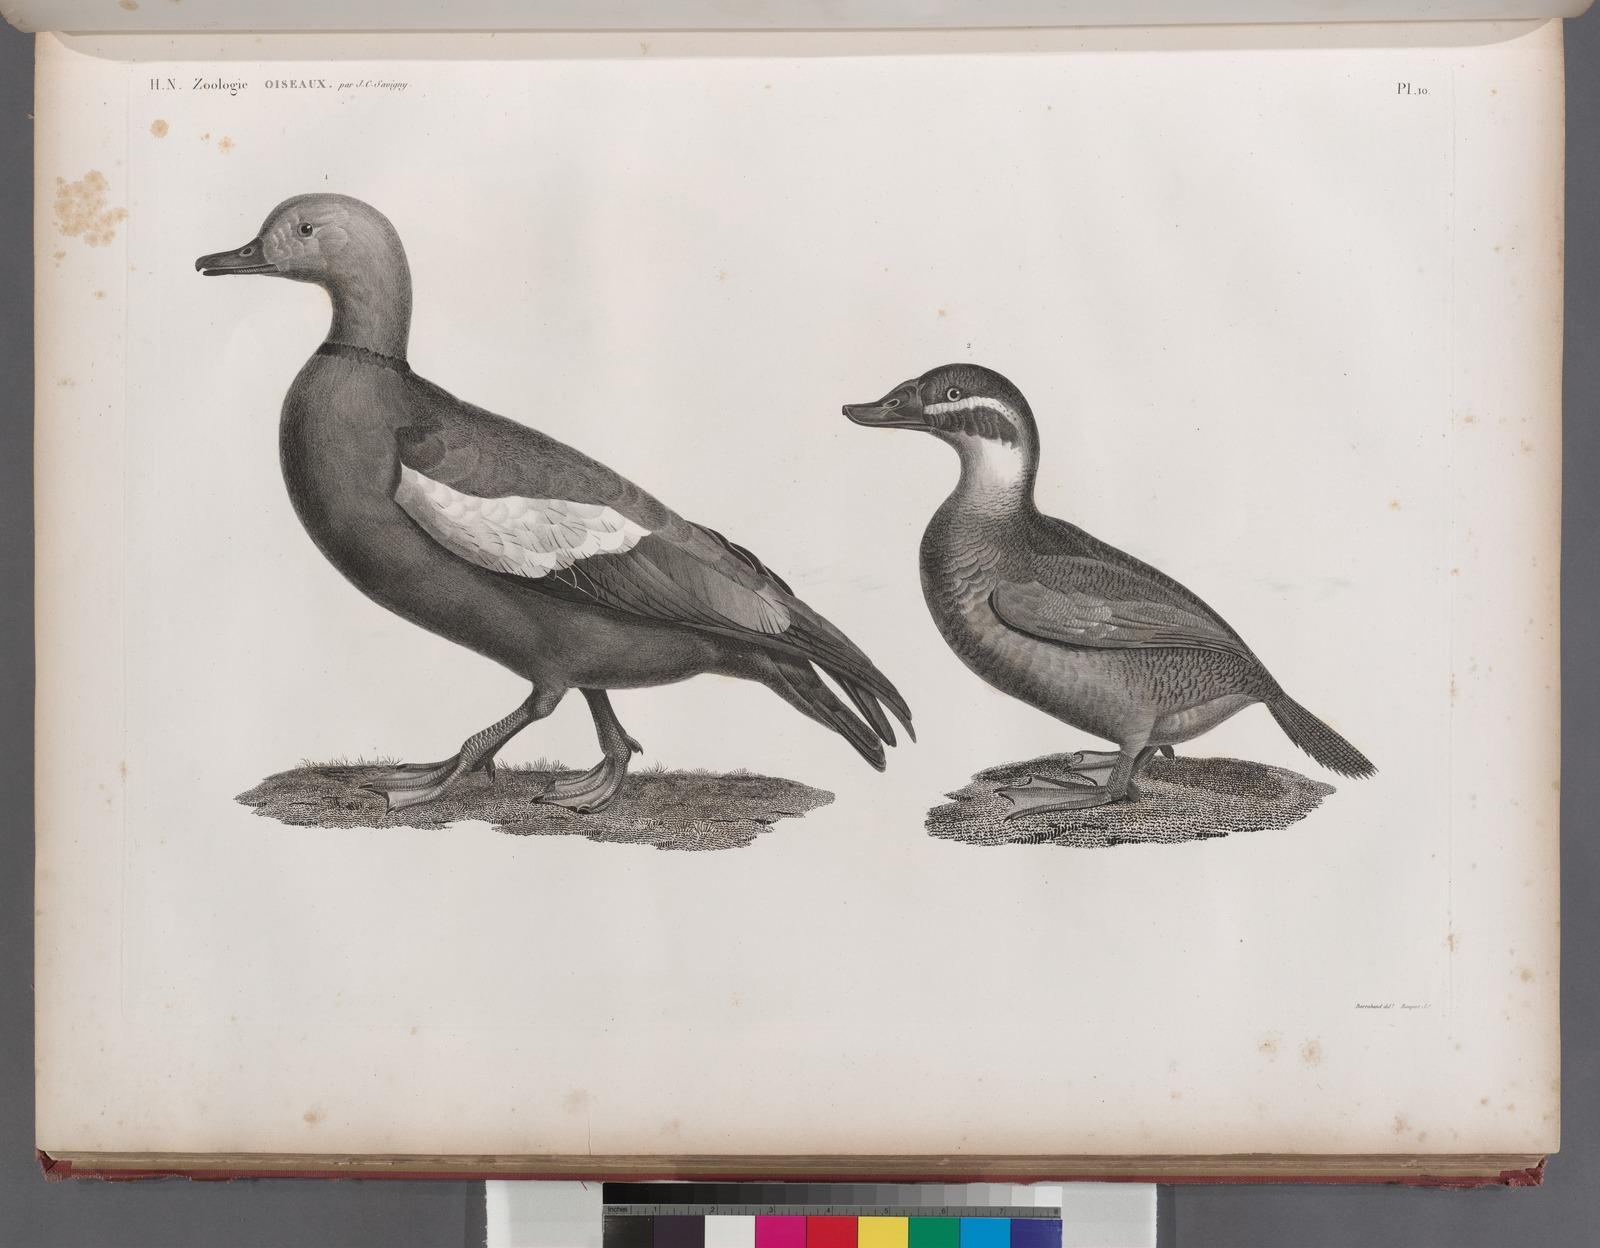 Zoologie. Oiseau. 1. Canard casarca (Anas casarca); 2. Canard à tête blanche (Anas leucocephala).